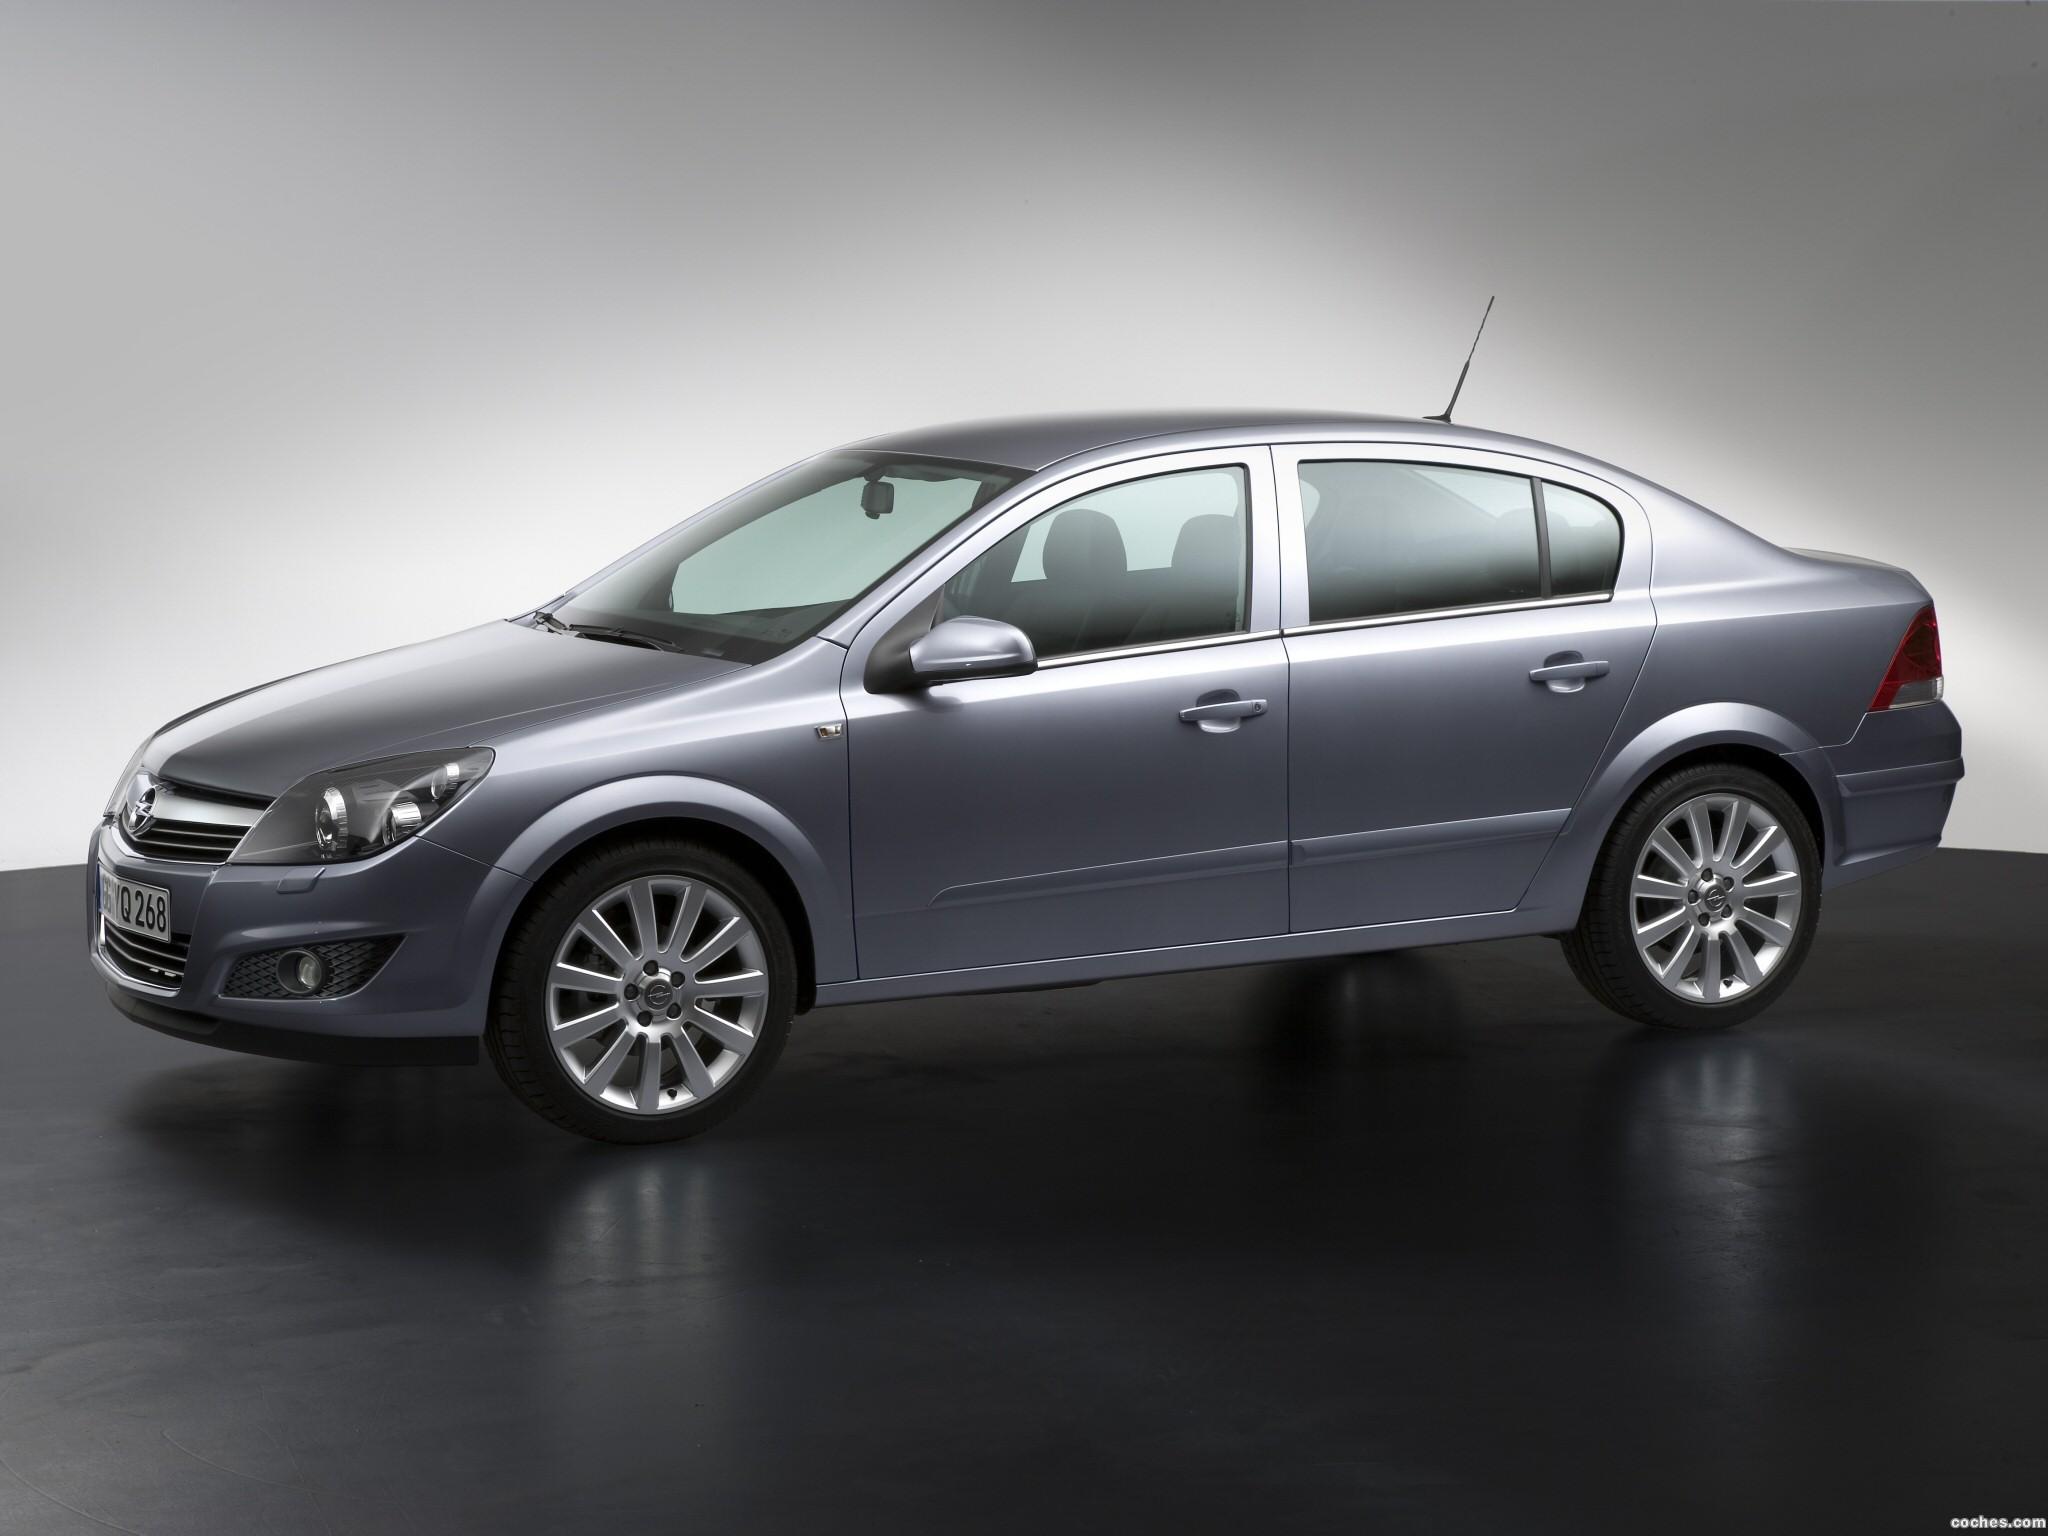 Foto 0 de Opel Astra Sedan H 2006